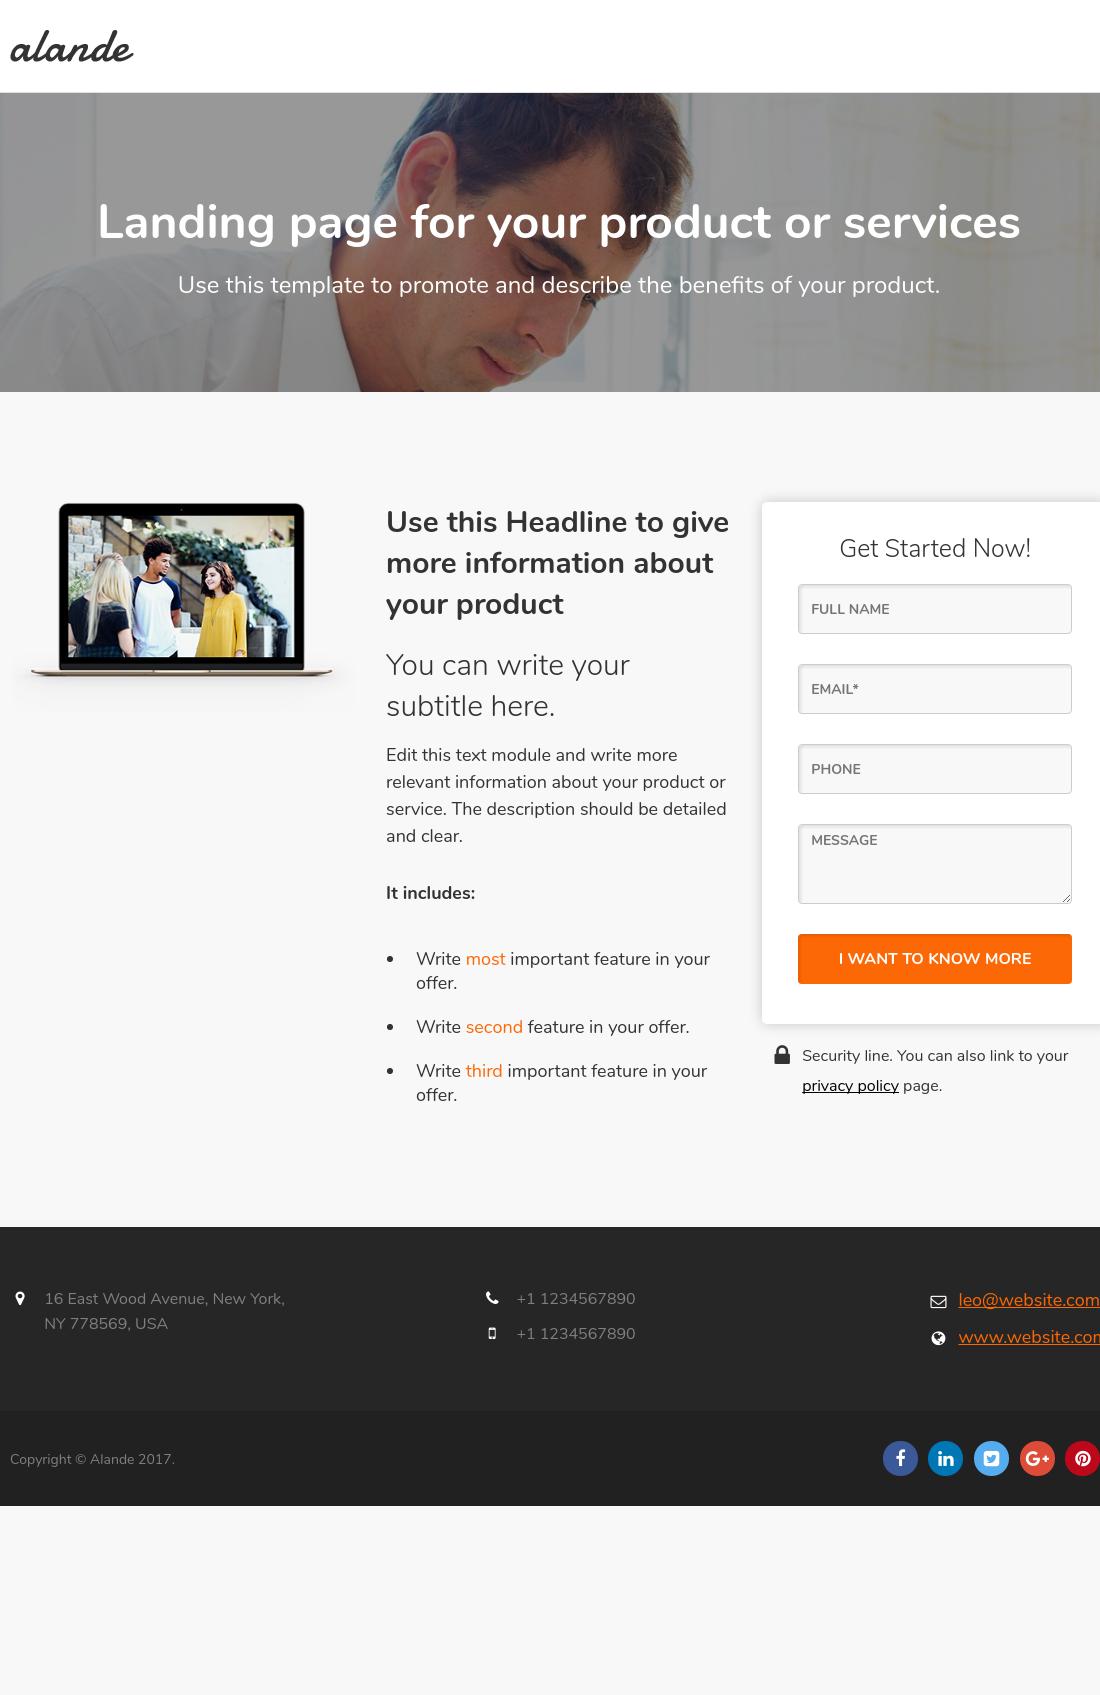 Alande Column Landing Page HubSpot - 3 column email template